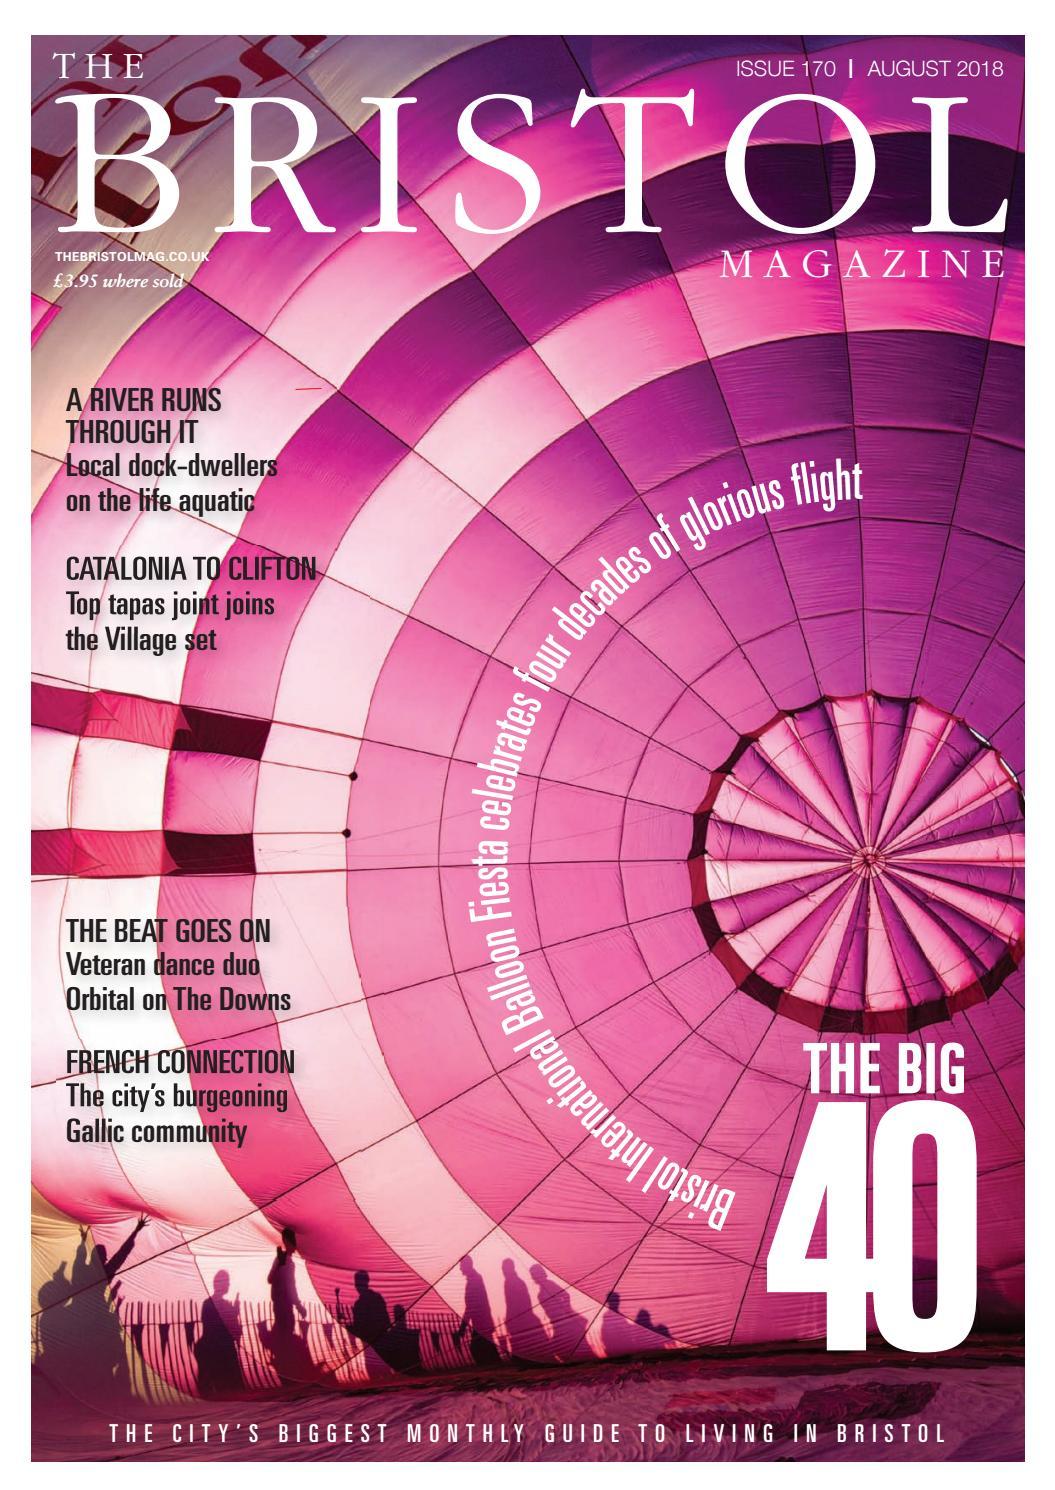 The Bristol Magazine August 2018 by MC Publishing - issuu